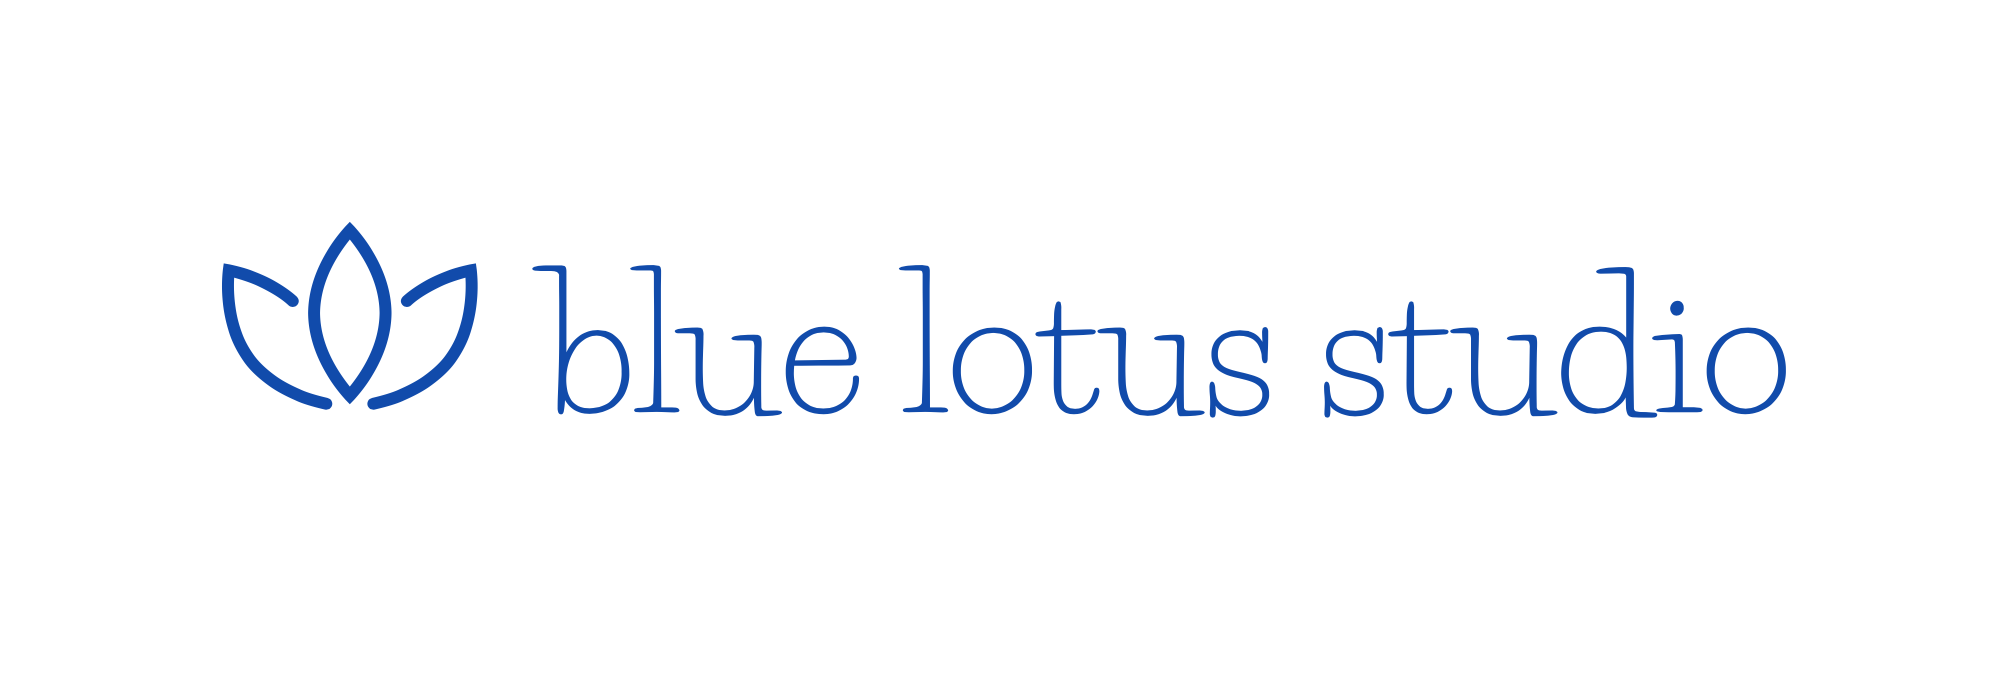 BlueLotus1.png